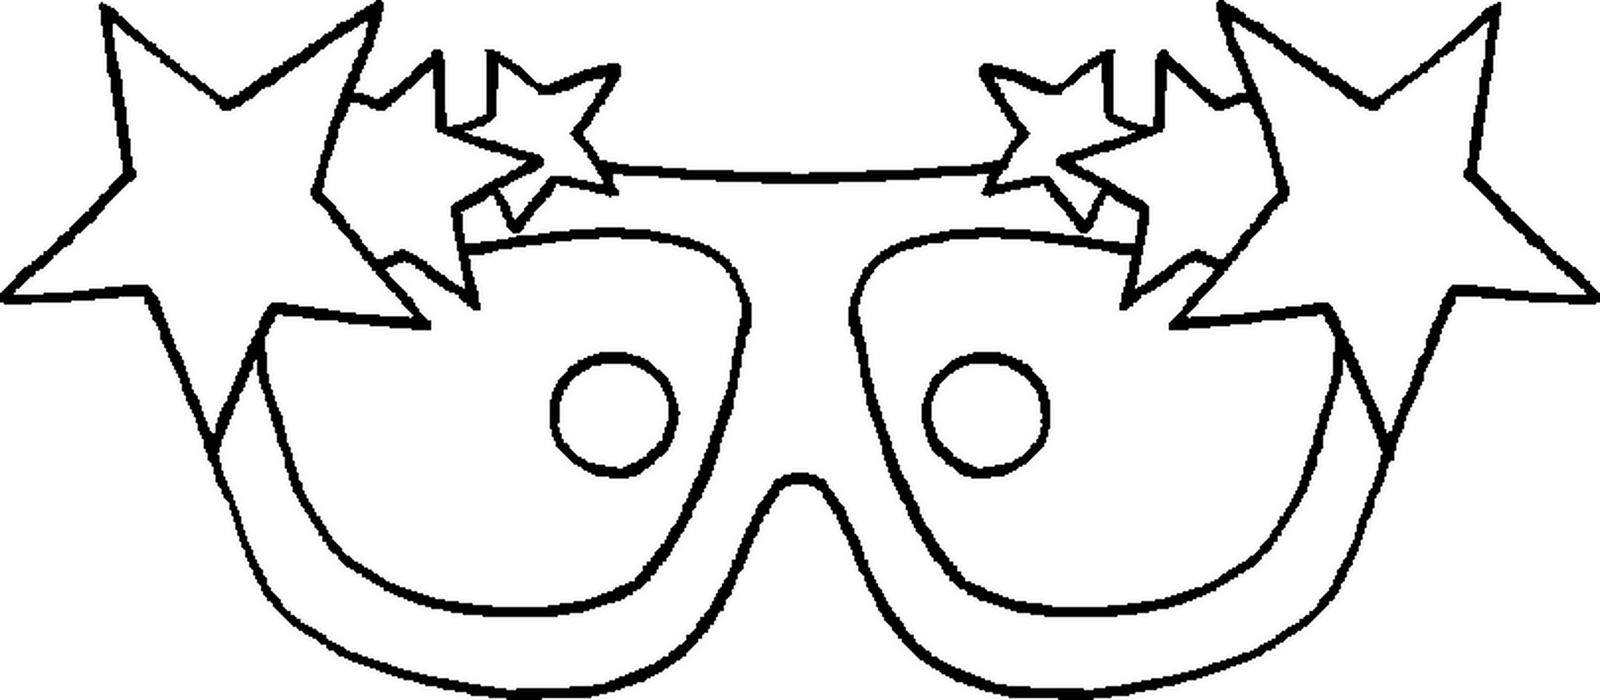 Mascaras de carnaval para imprimir auto design tech - Dibujos de halloween ...